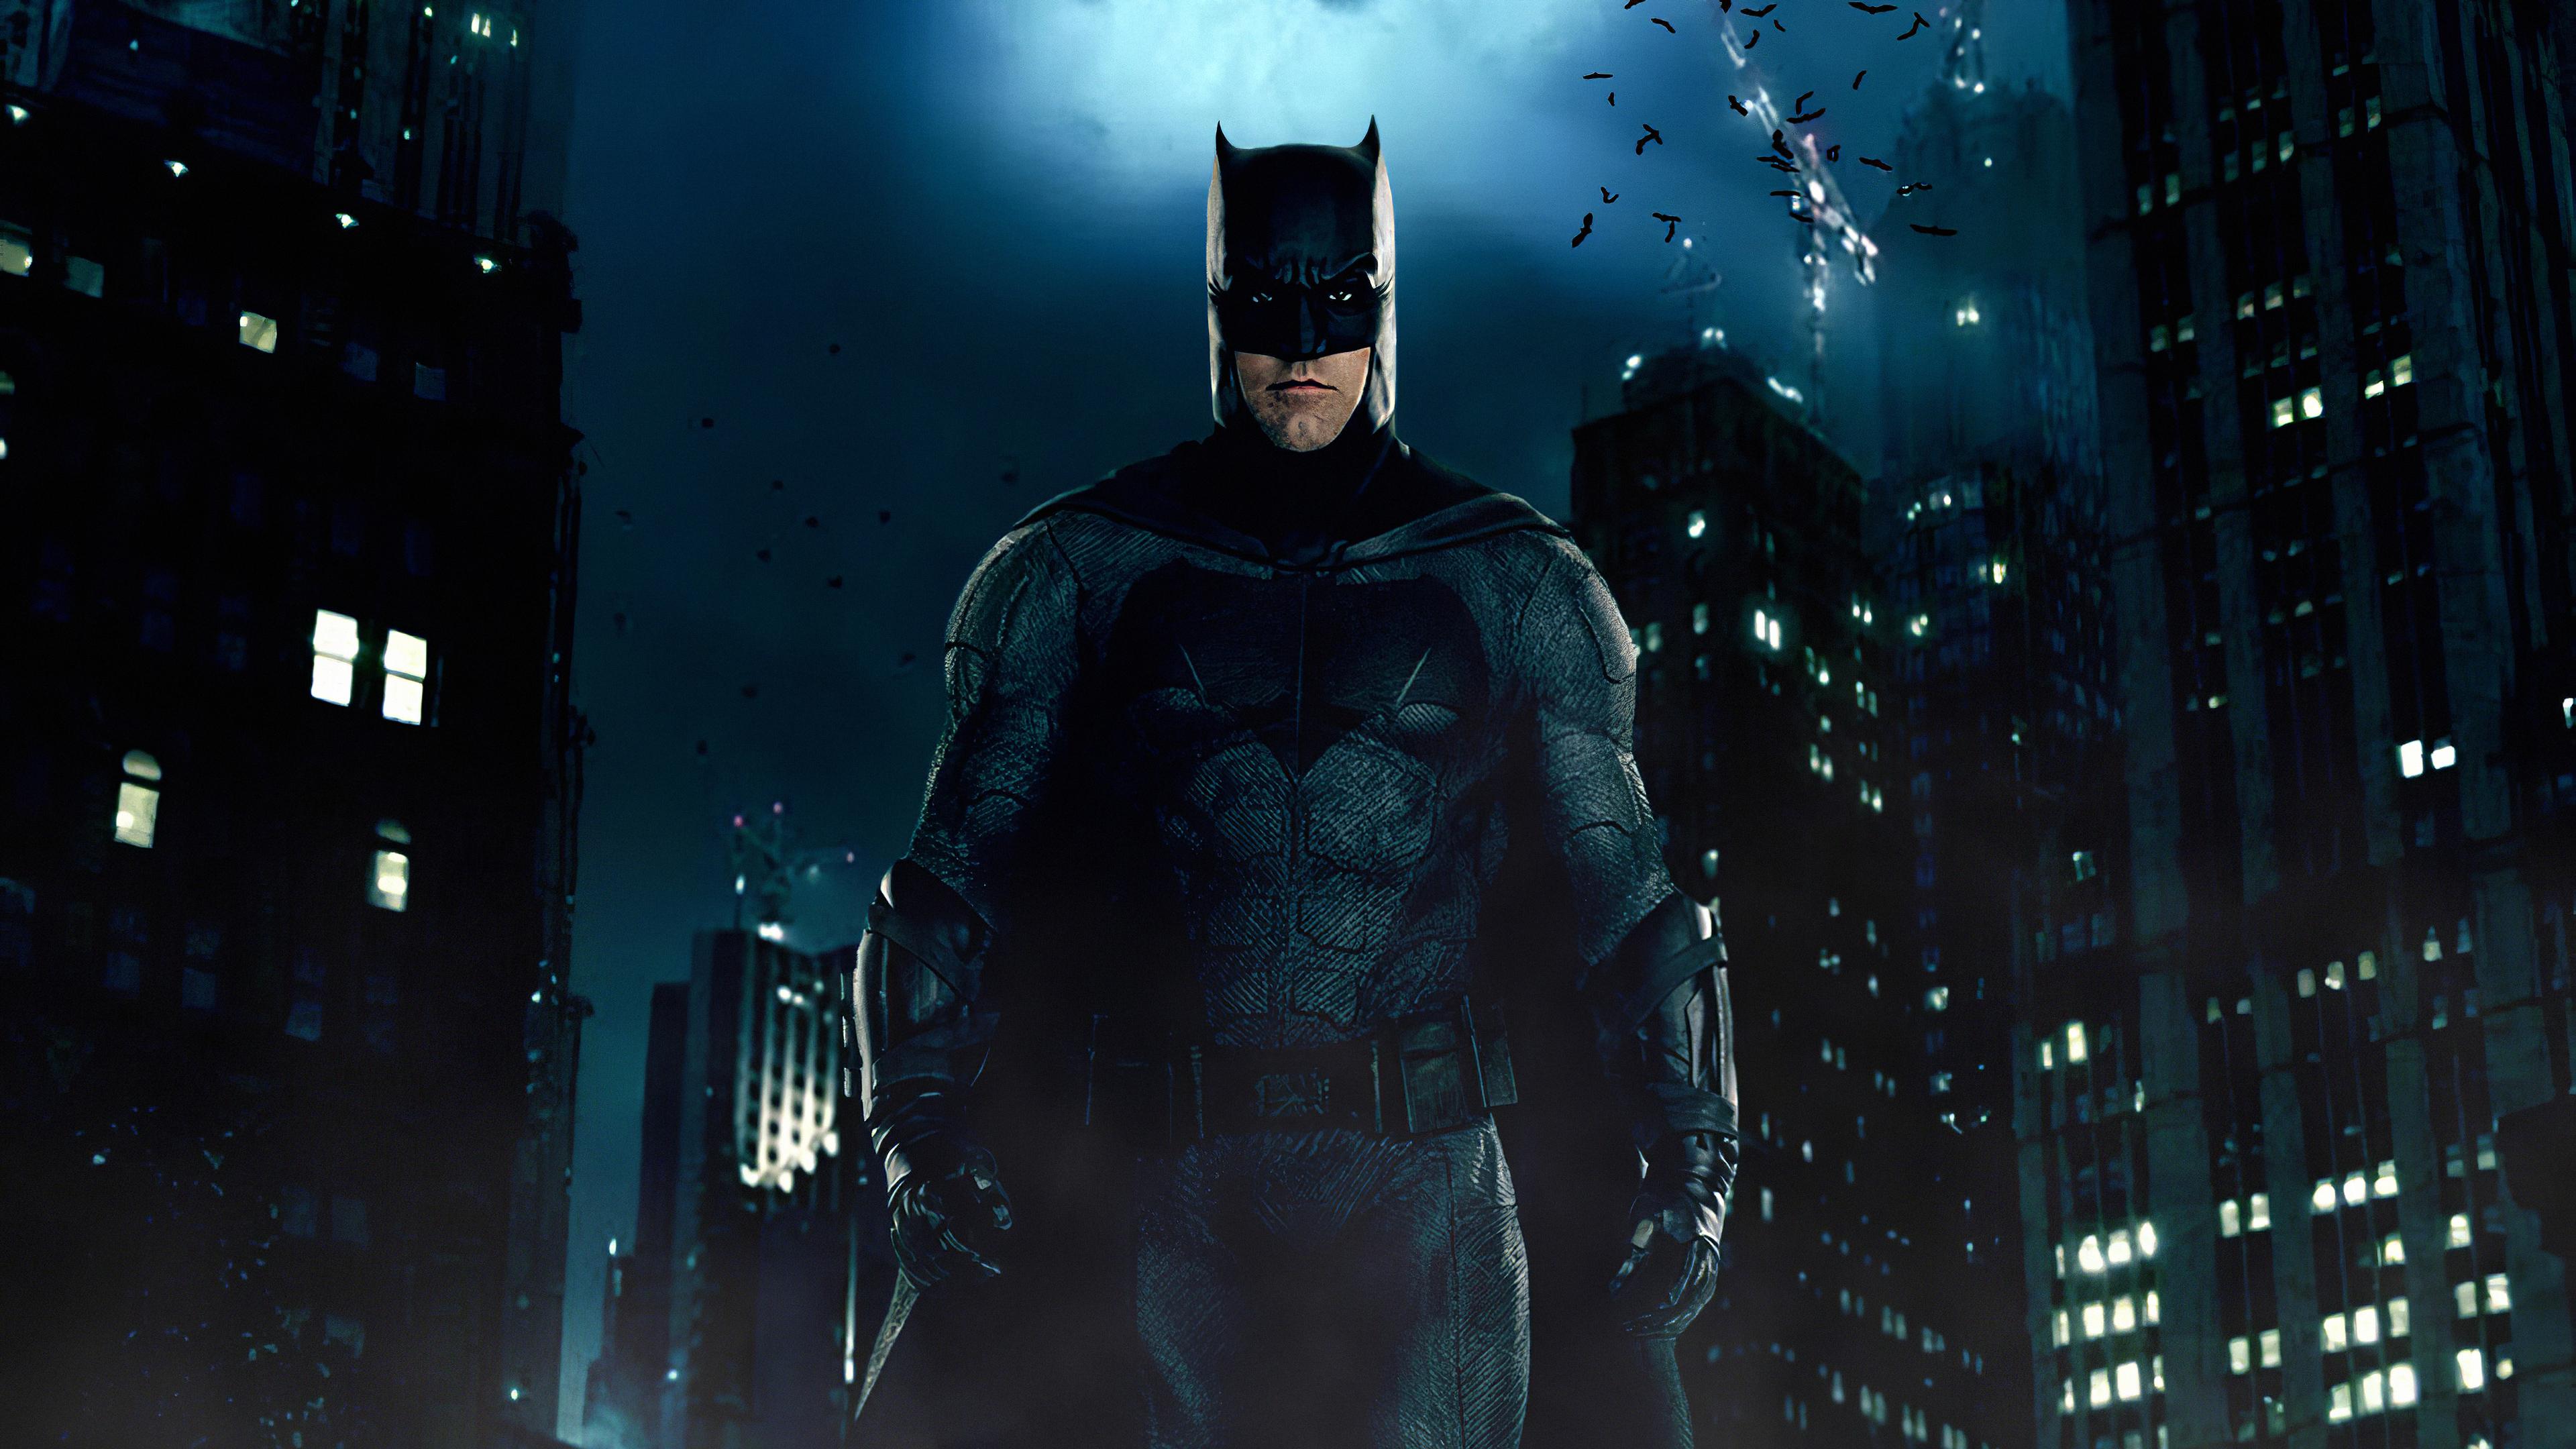 batman new art 2019 1572368670 - Batman New Art 2019 - superheroes wallpapers, portrait wallpapers, hd-wallpapers, batman wallpapers, artwork wallpapers, arstation wallpapers, 4k-wallpapers